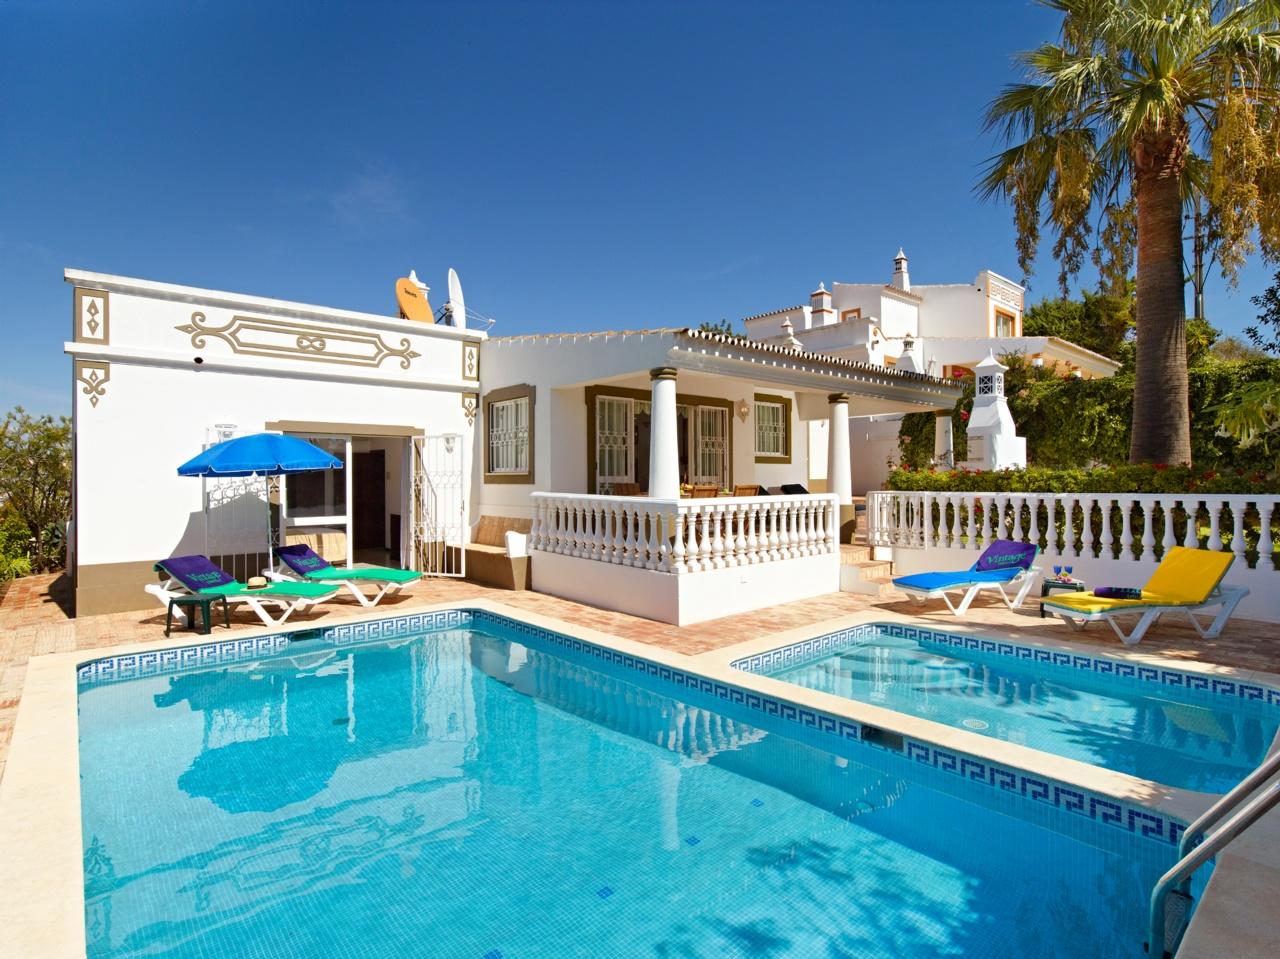 Villas with Children's Pools